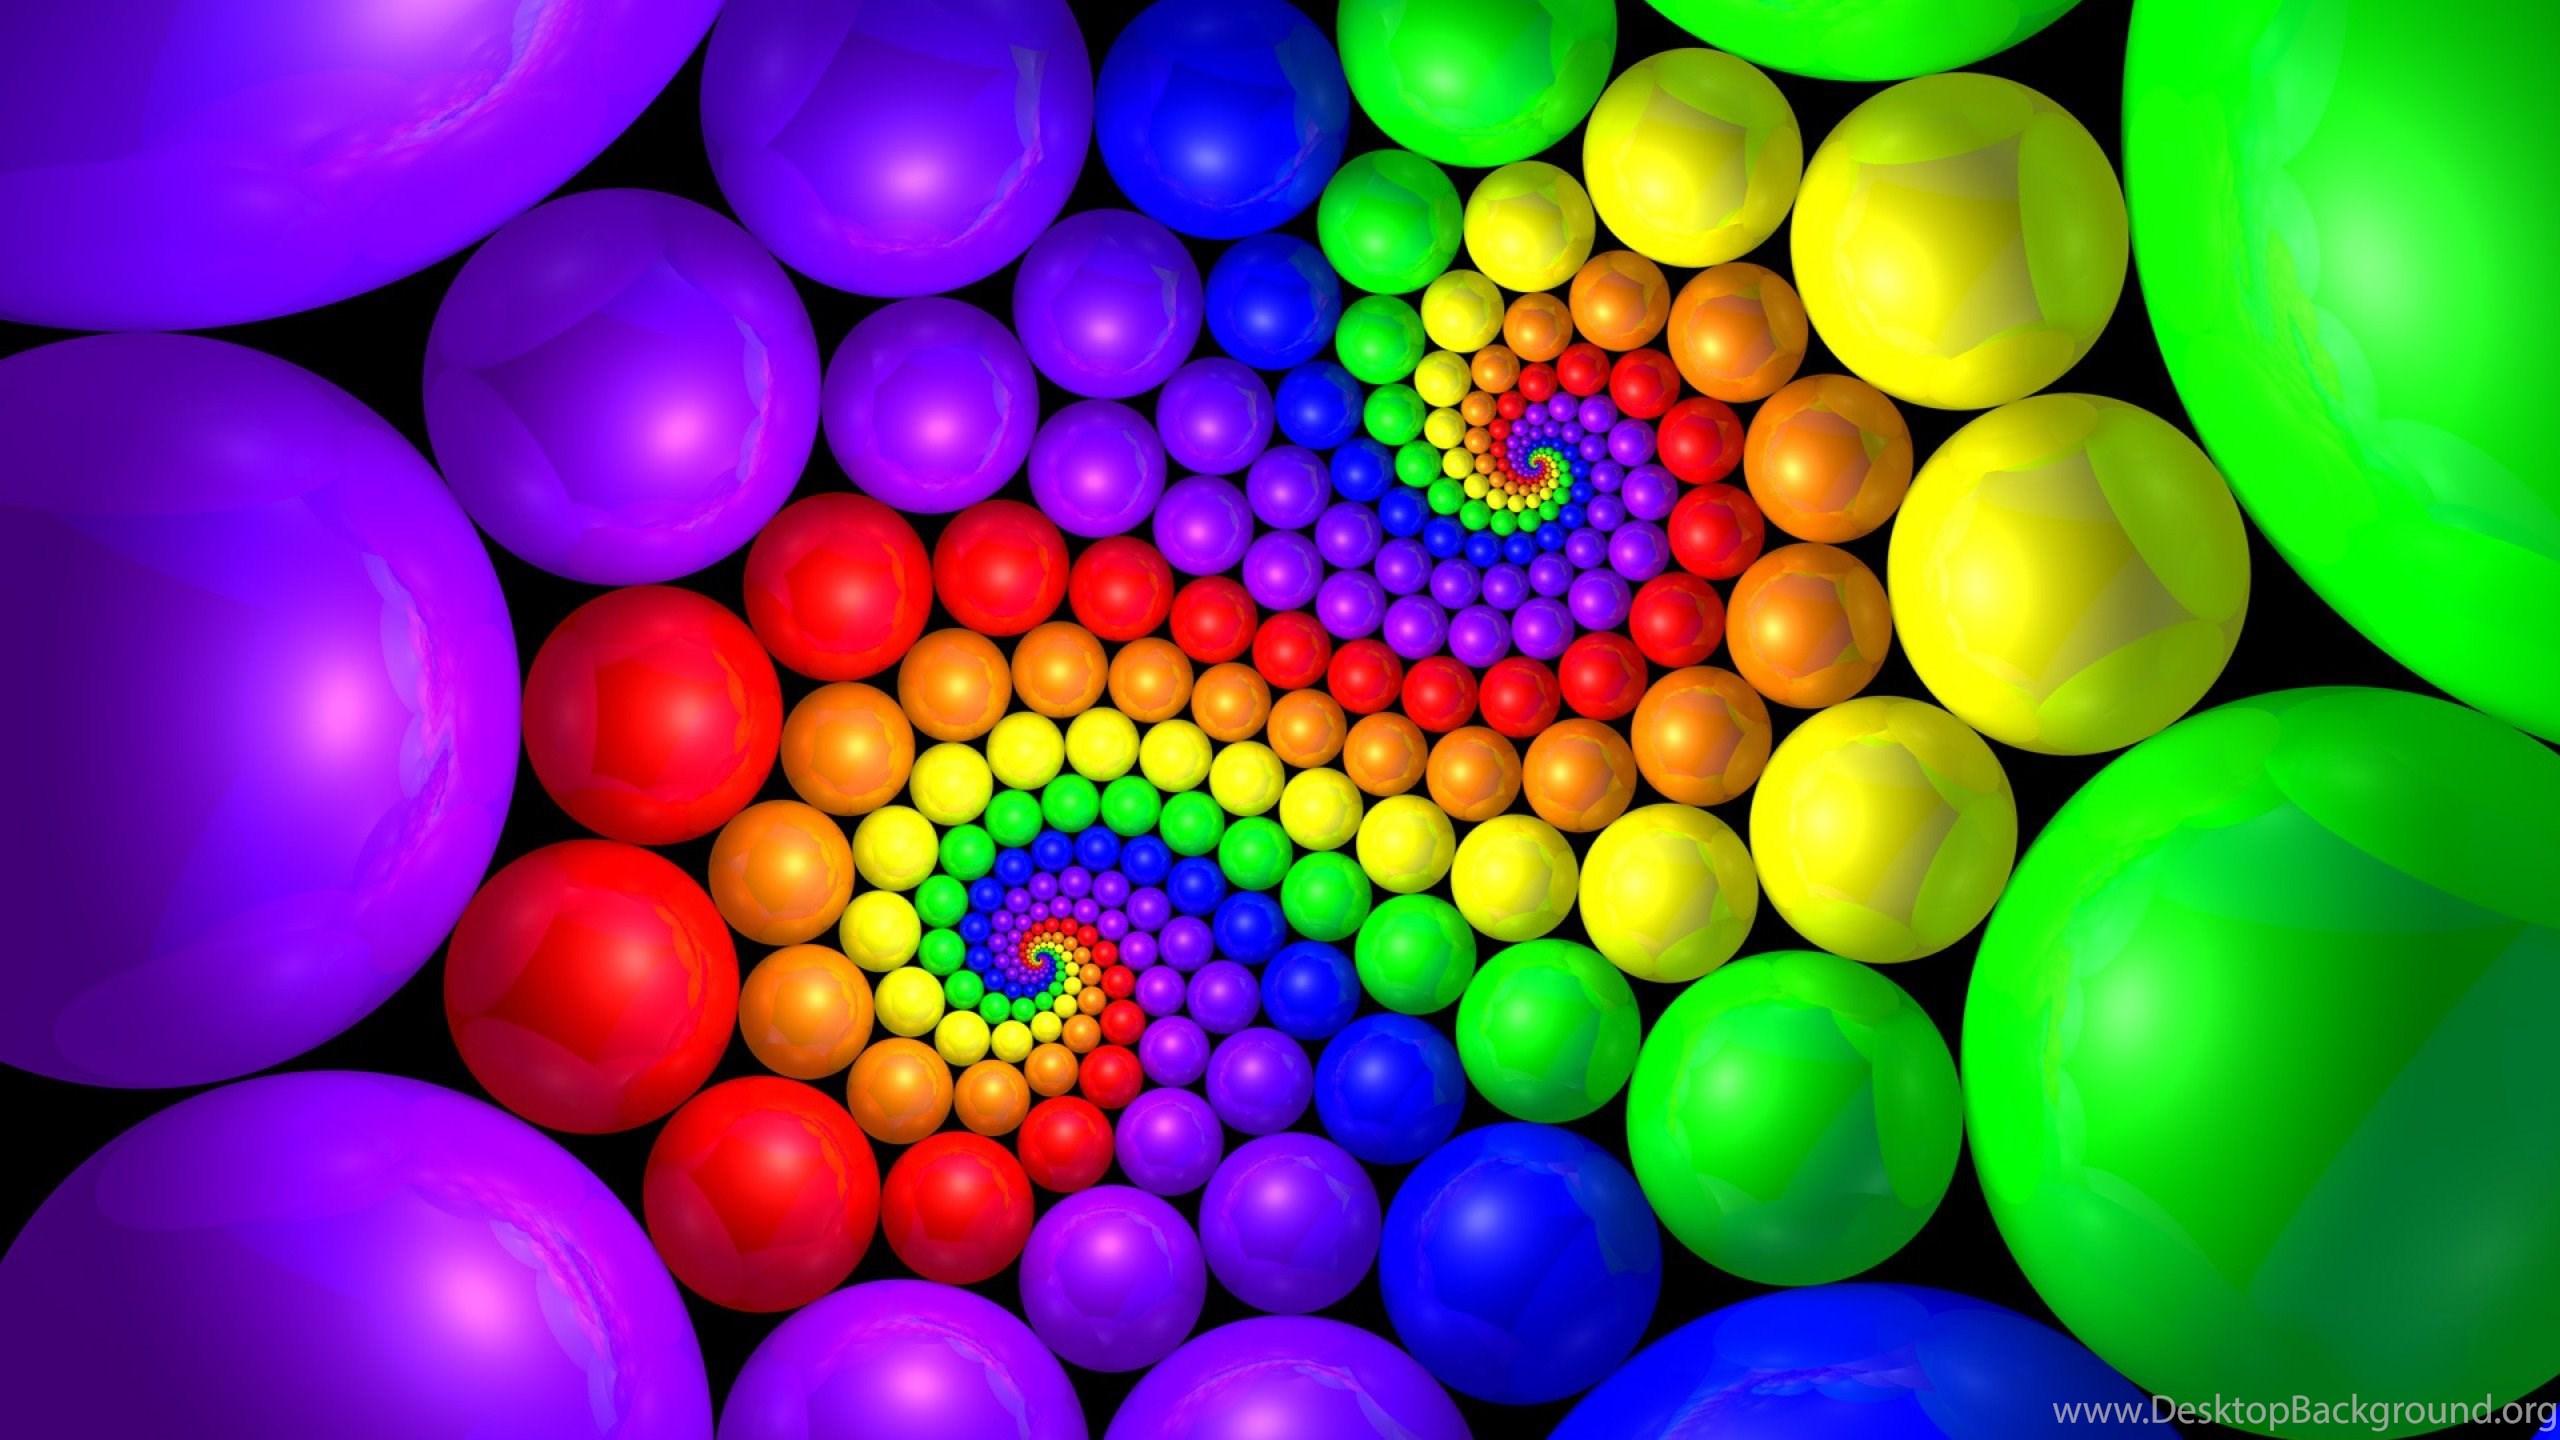 Wallpapers 3D Full Color HD Desktop Wallpapers 7920 Desktop Background